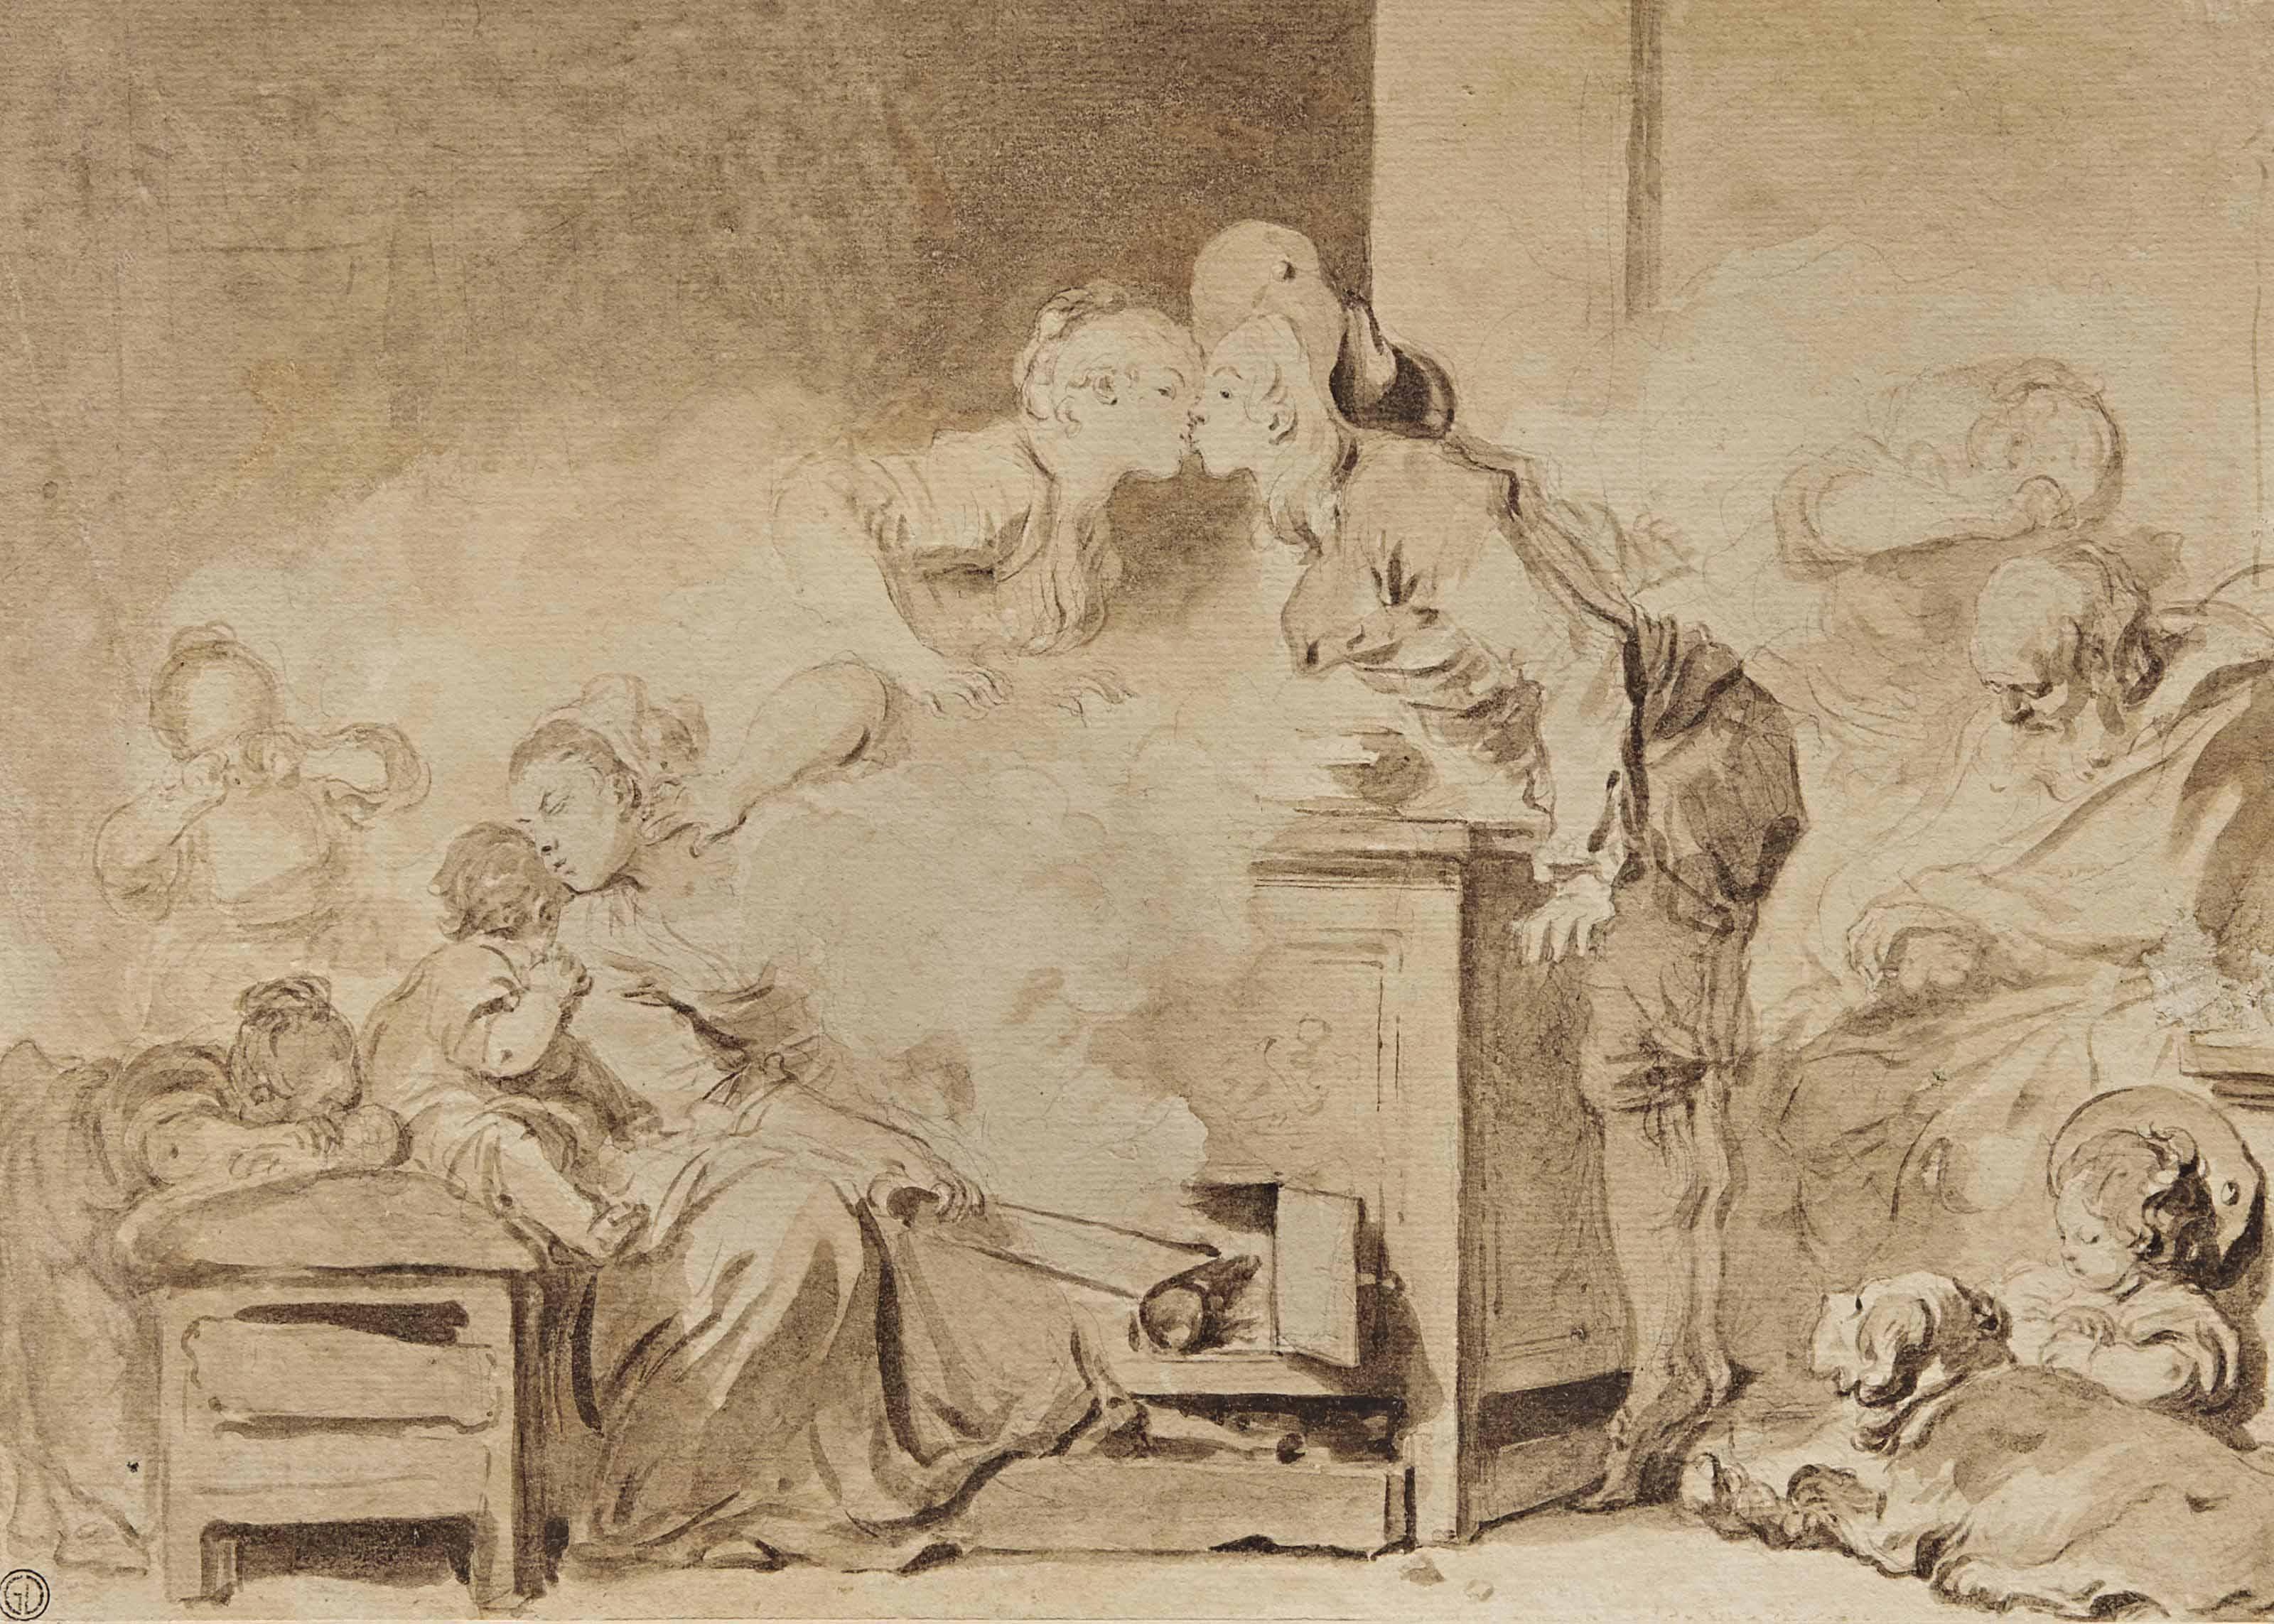 JEAN-HONORÉ FRAGONARD (GRASSE 1732-1806 PARIS)